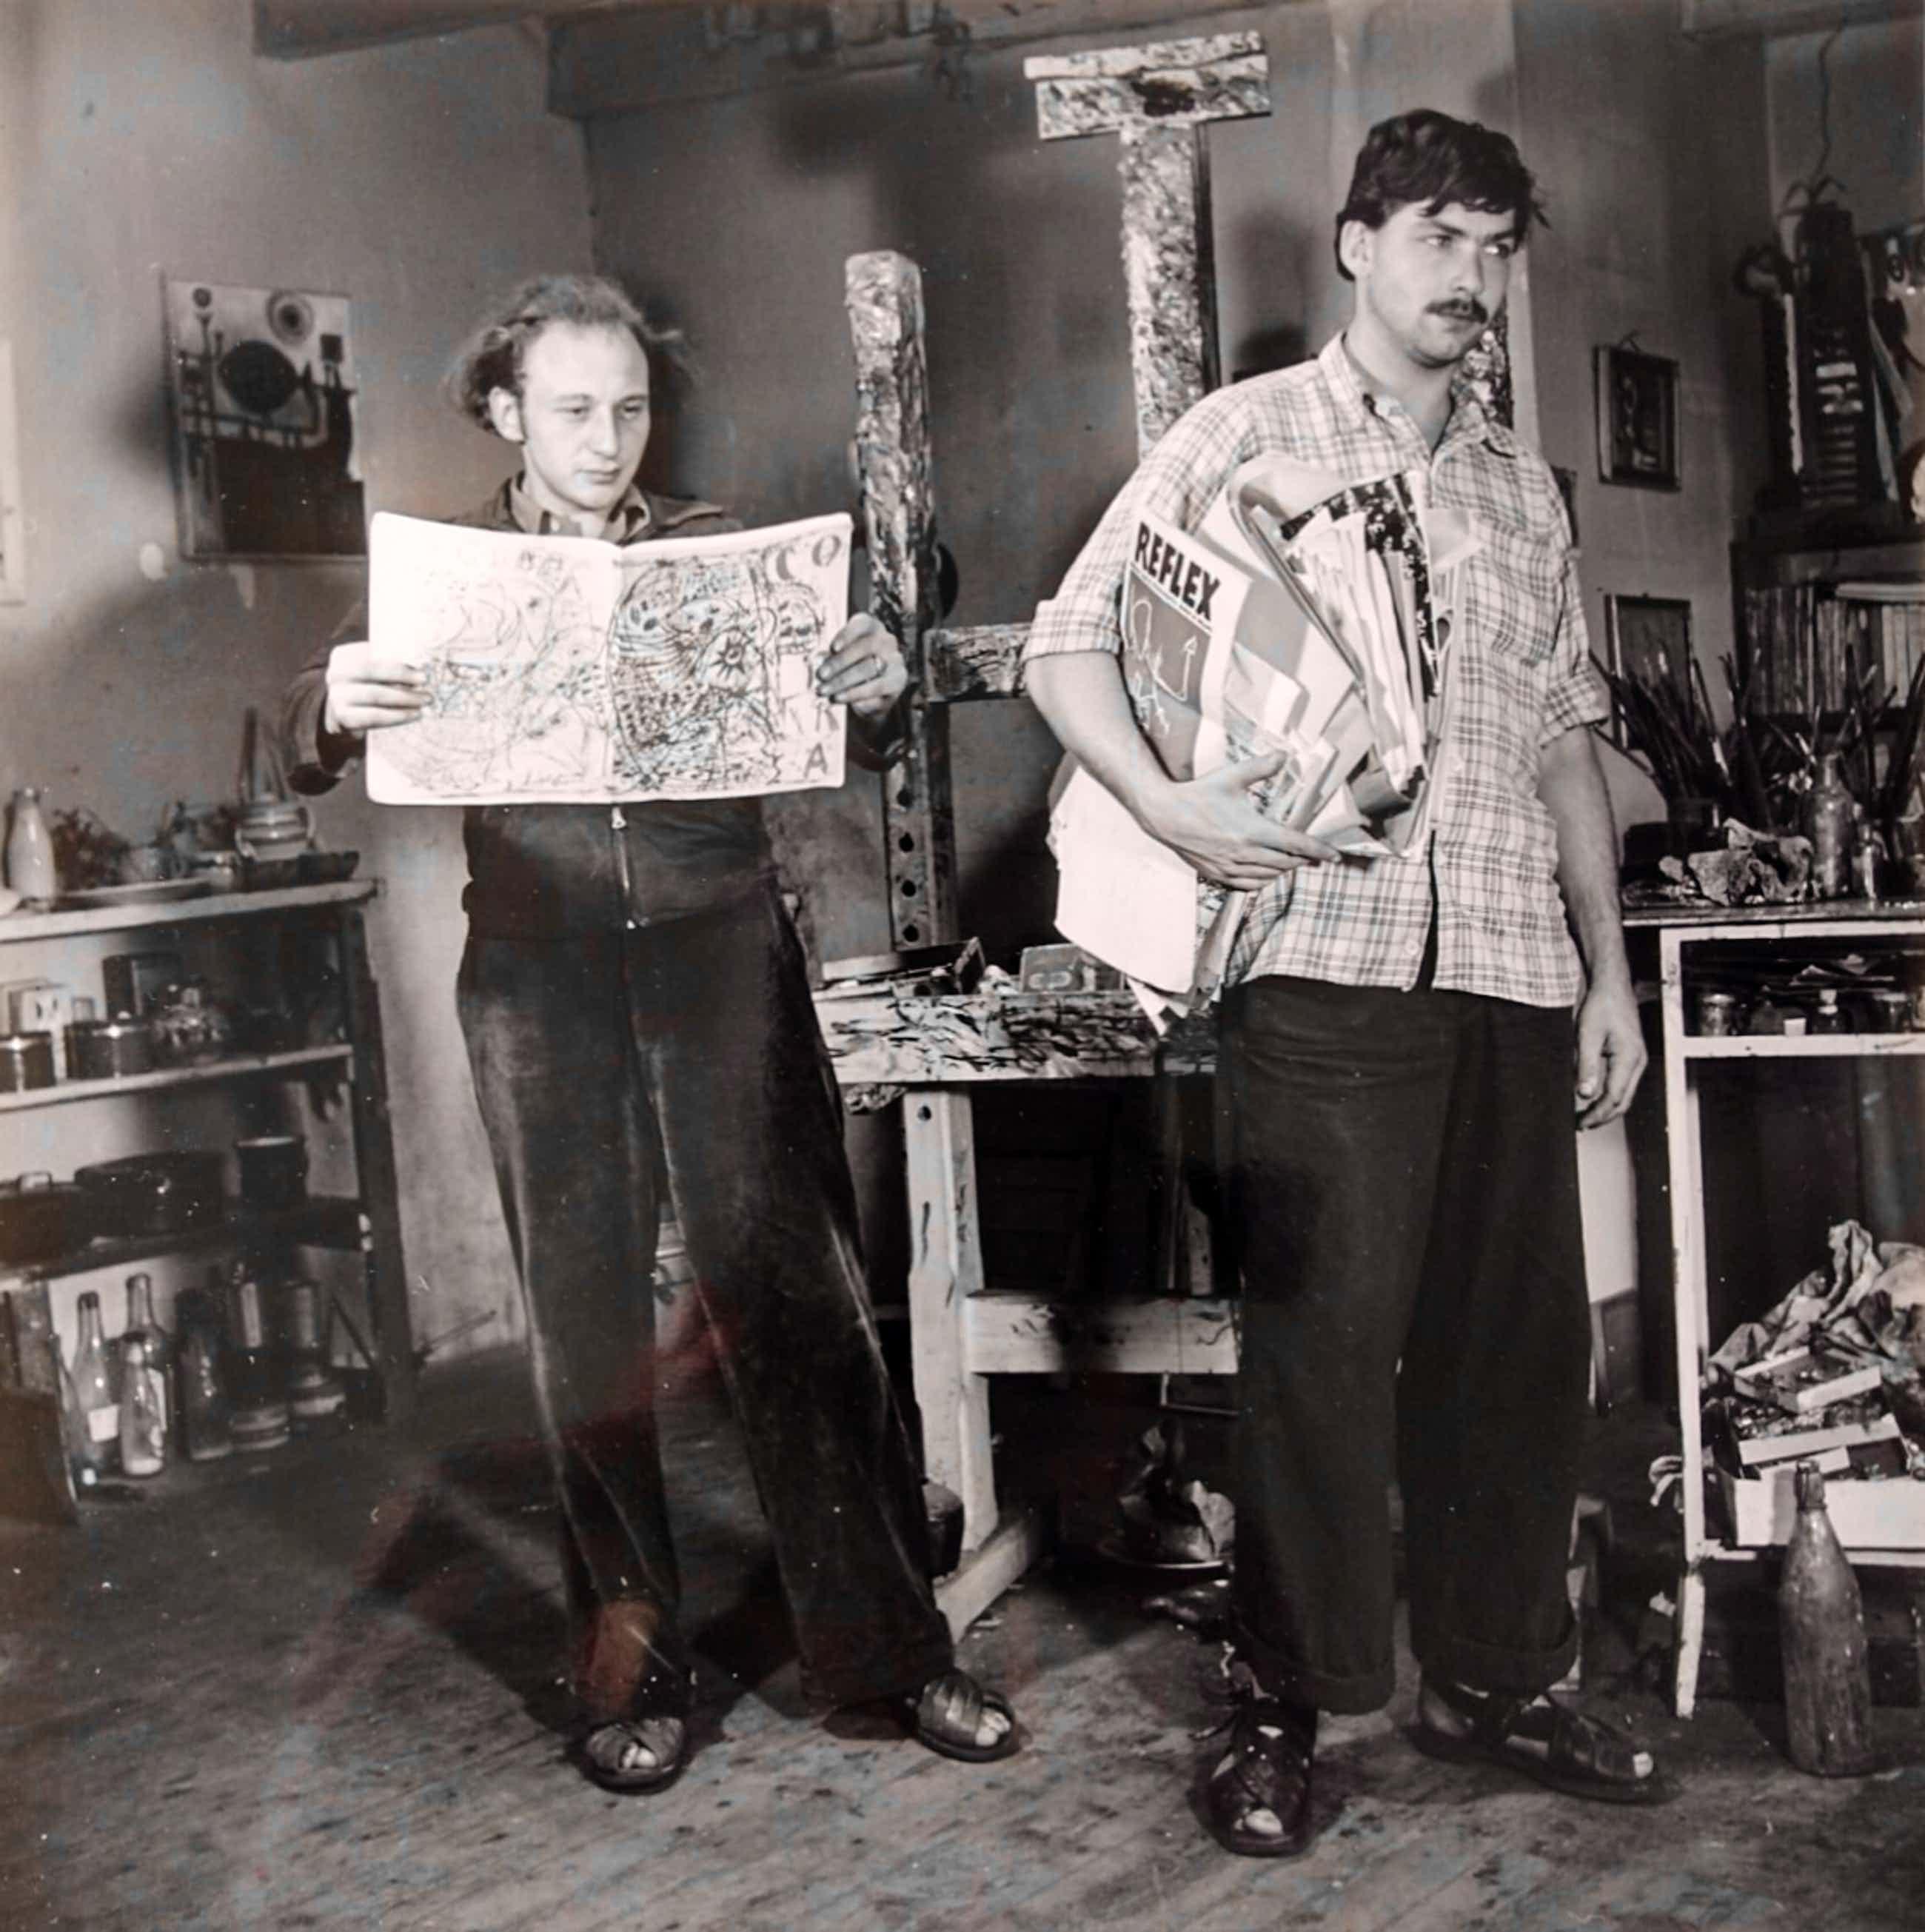 Karel Appel - Henny Riemens foto Karel Appel en Theo Wolvecamp COBRA 1949-51 kopen? Bied vanaf 45!